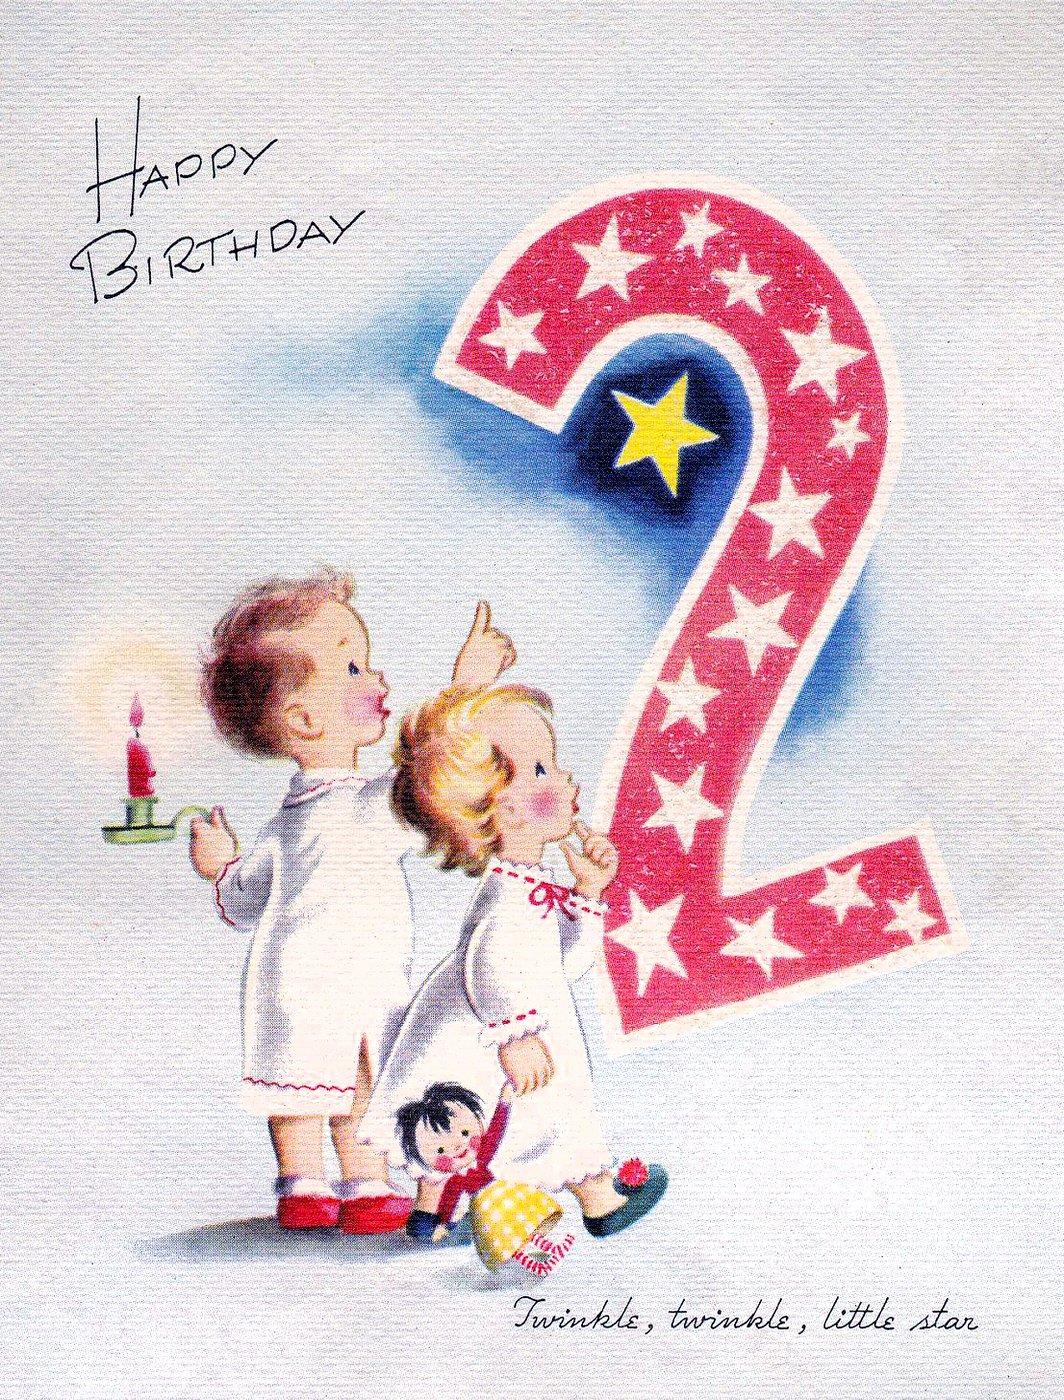 Vintage 1940s Happy Birthday card - 2 years old